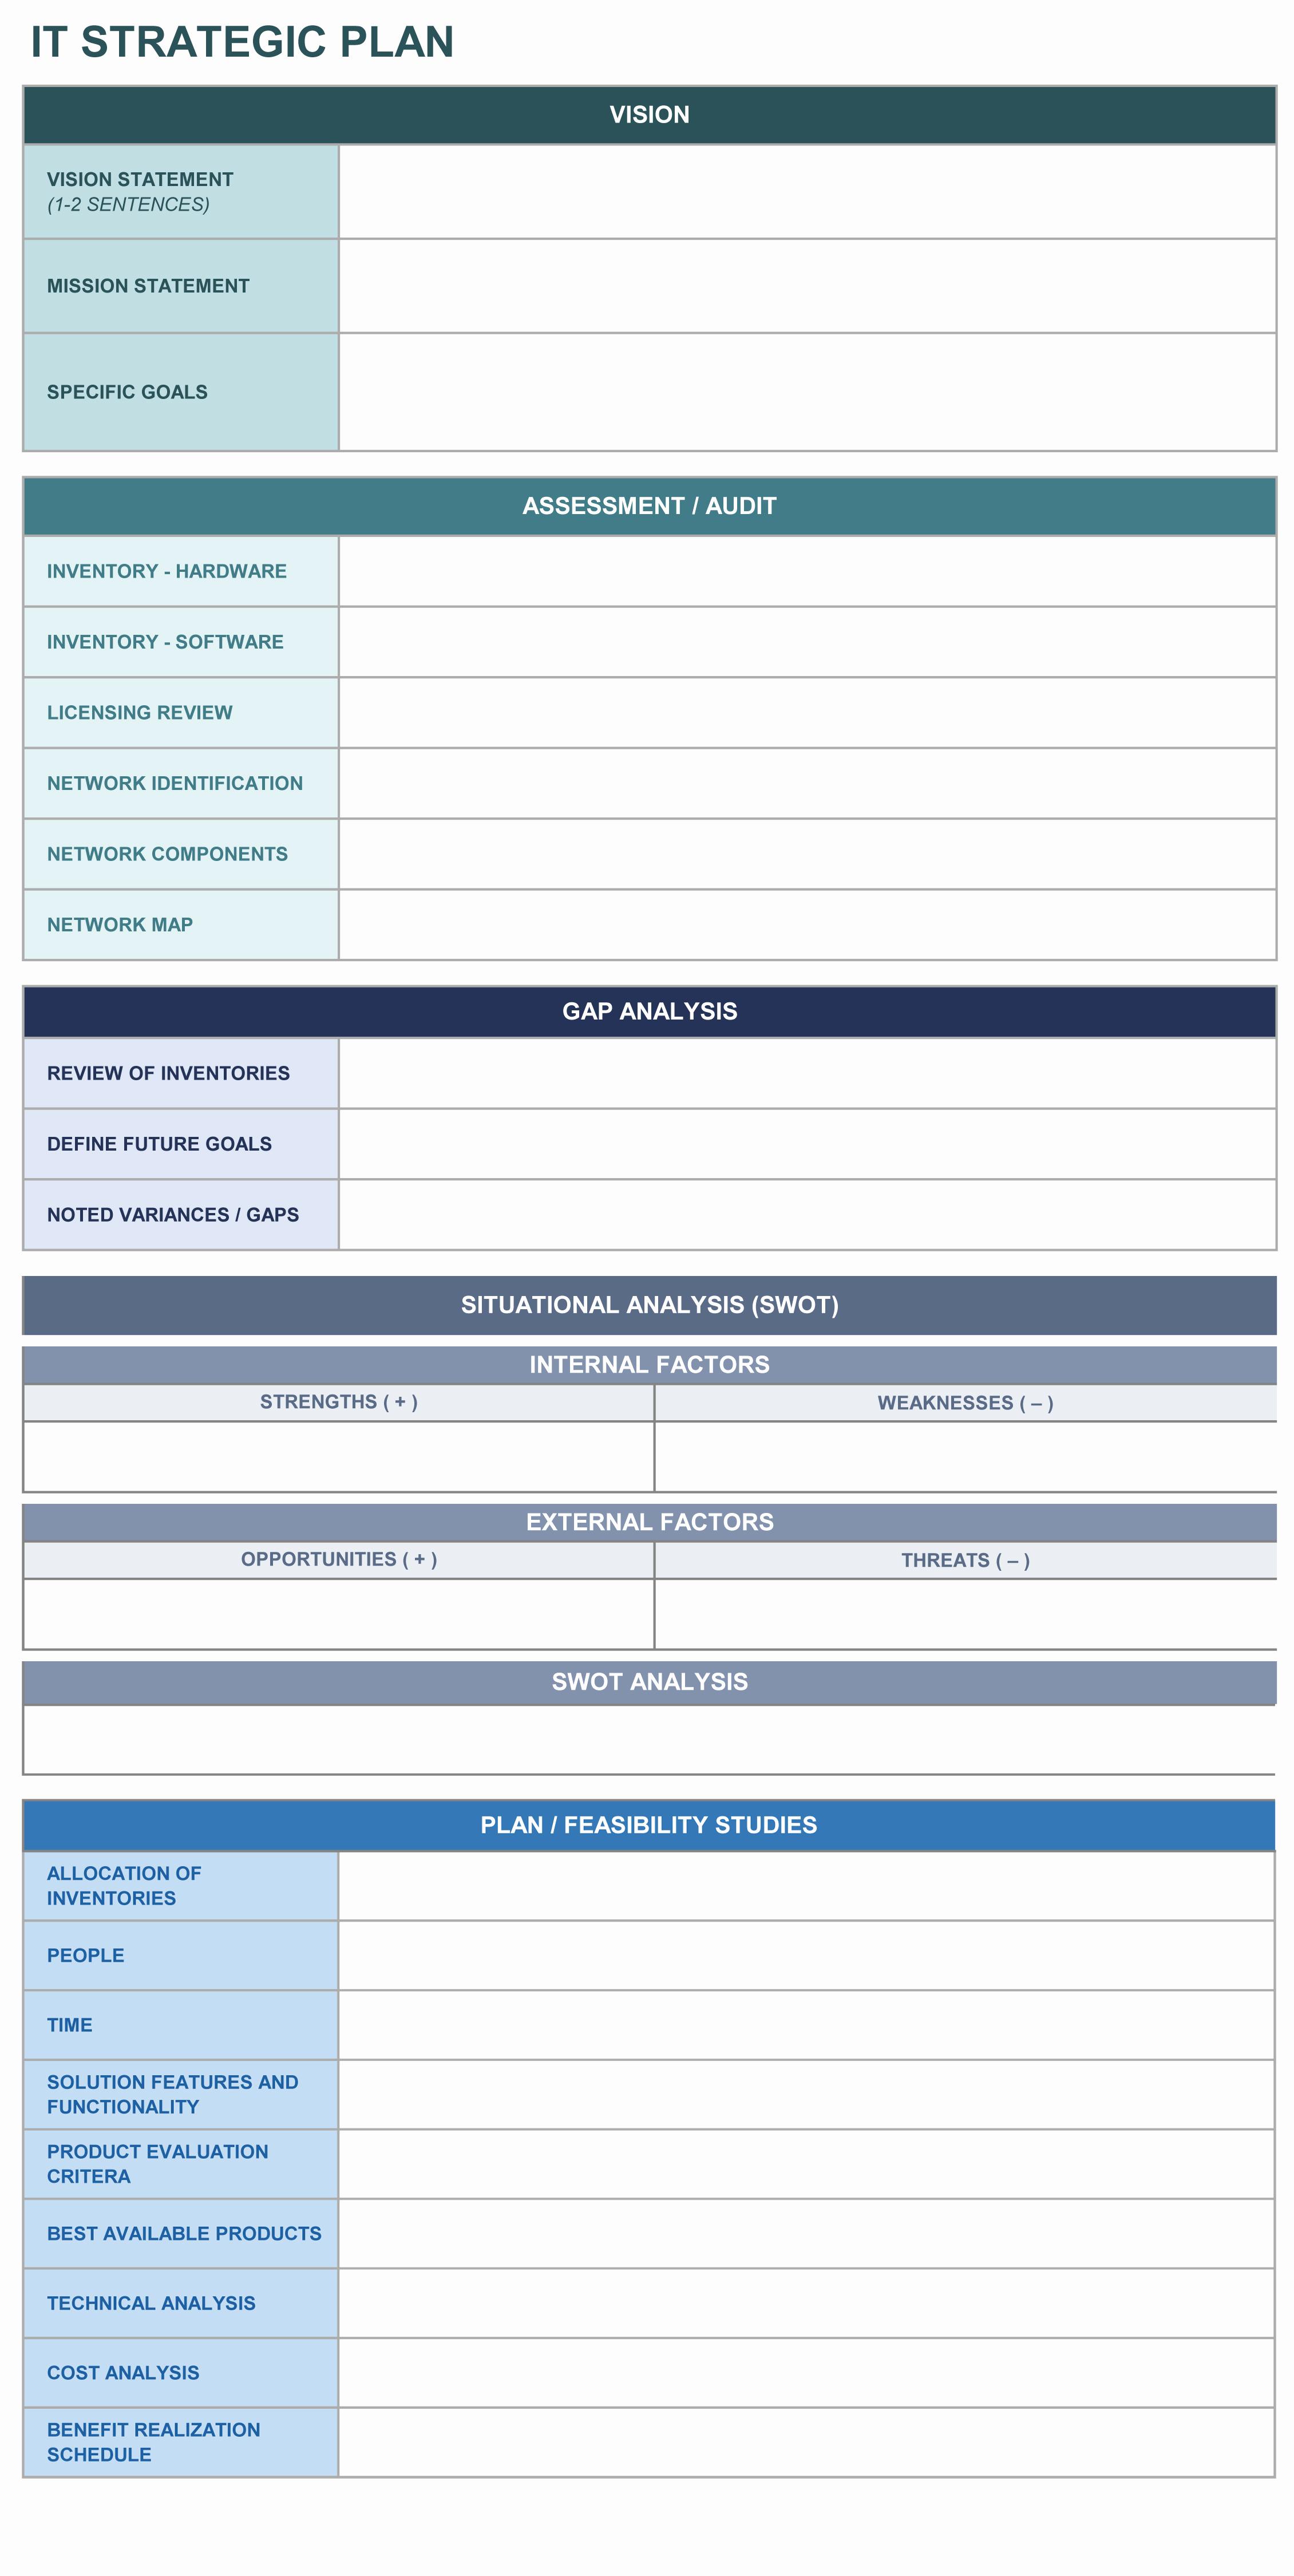 Strategic Planning Template Word Fresh 9 Free Strategic Planning Templates Smartsheet